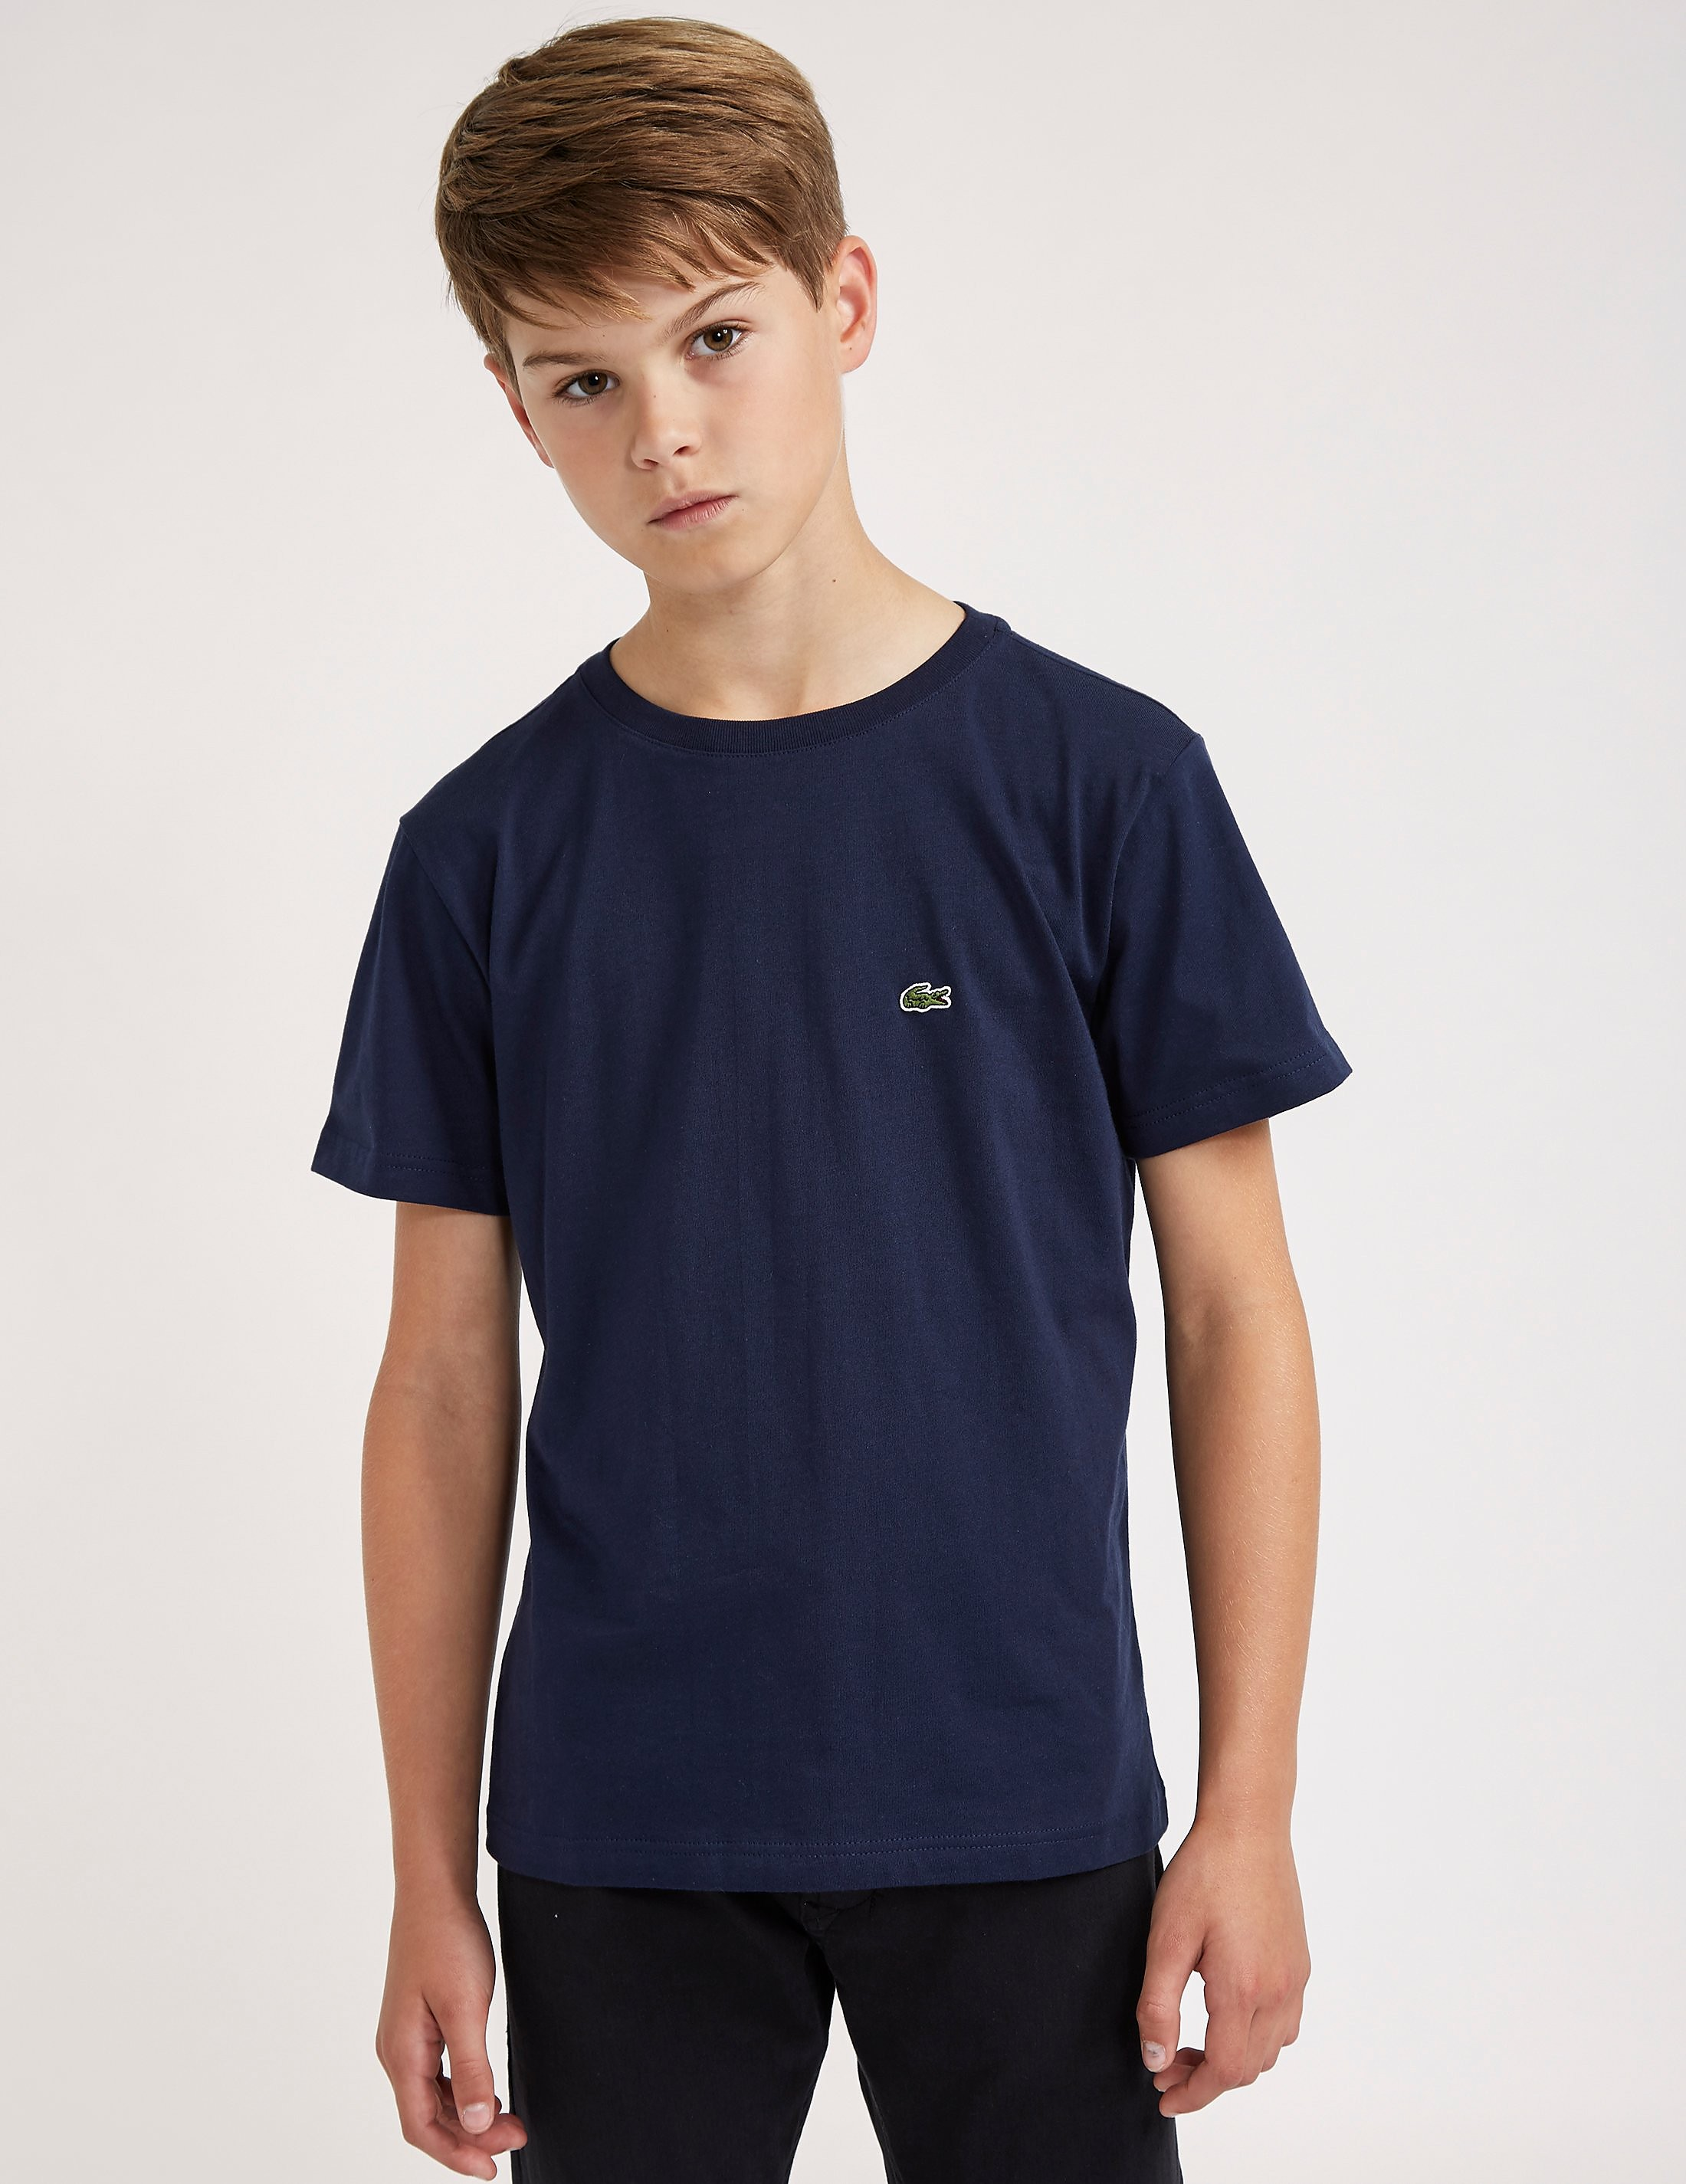 Lacoste Crew Neck Short Sleeve T-Shirt